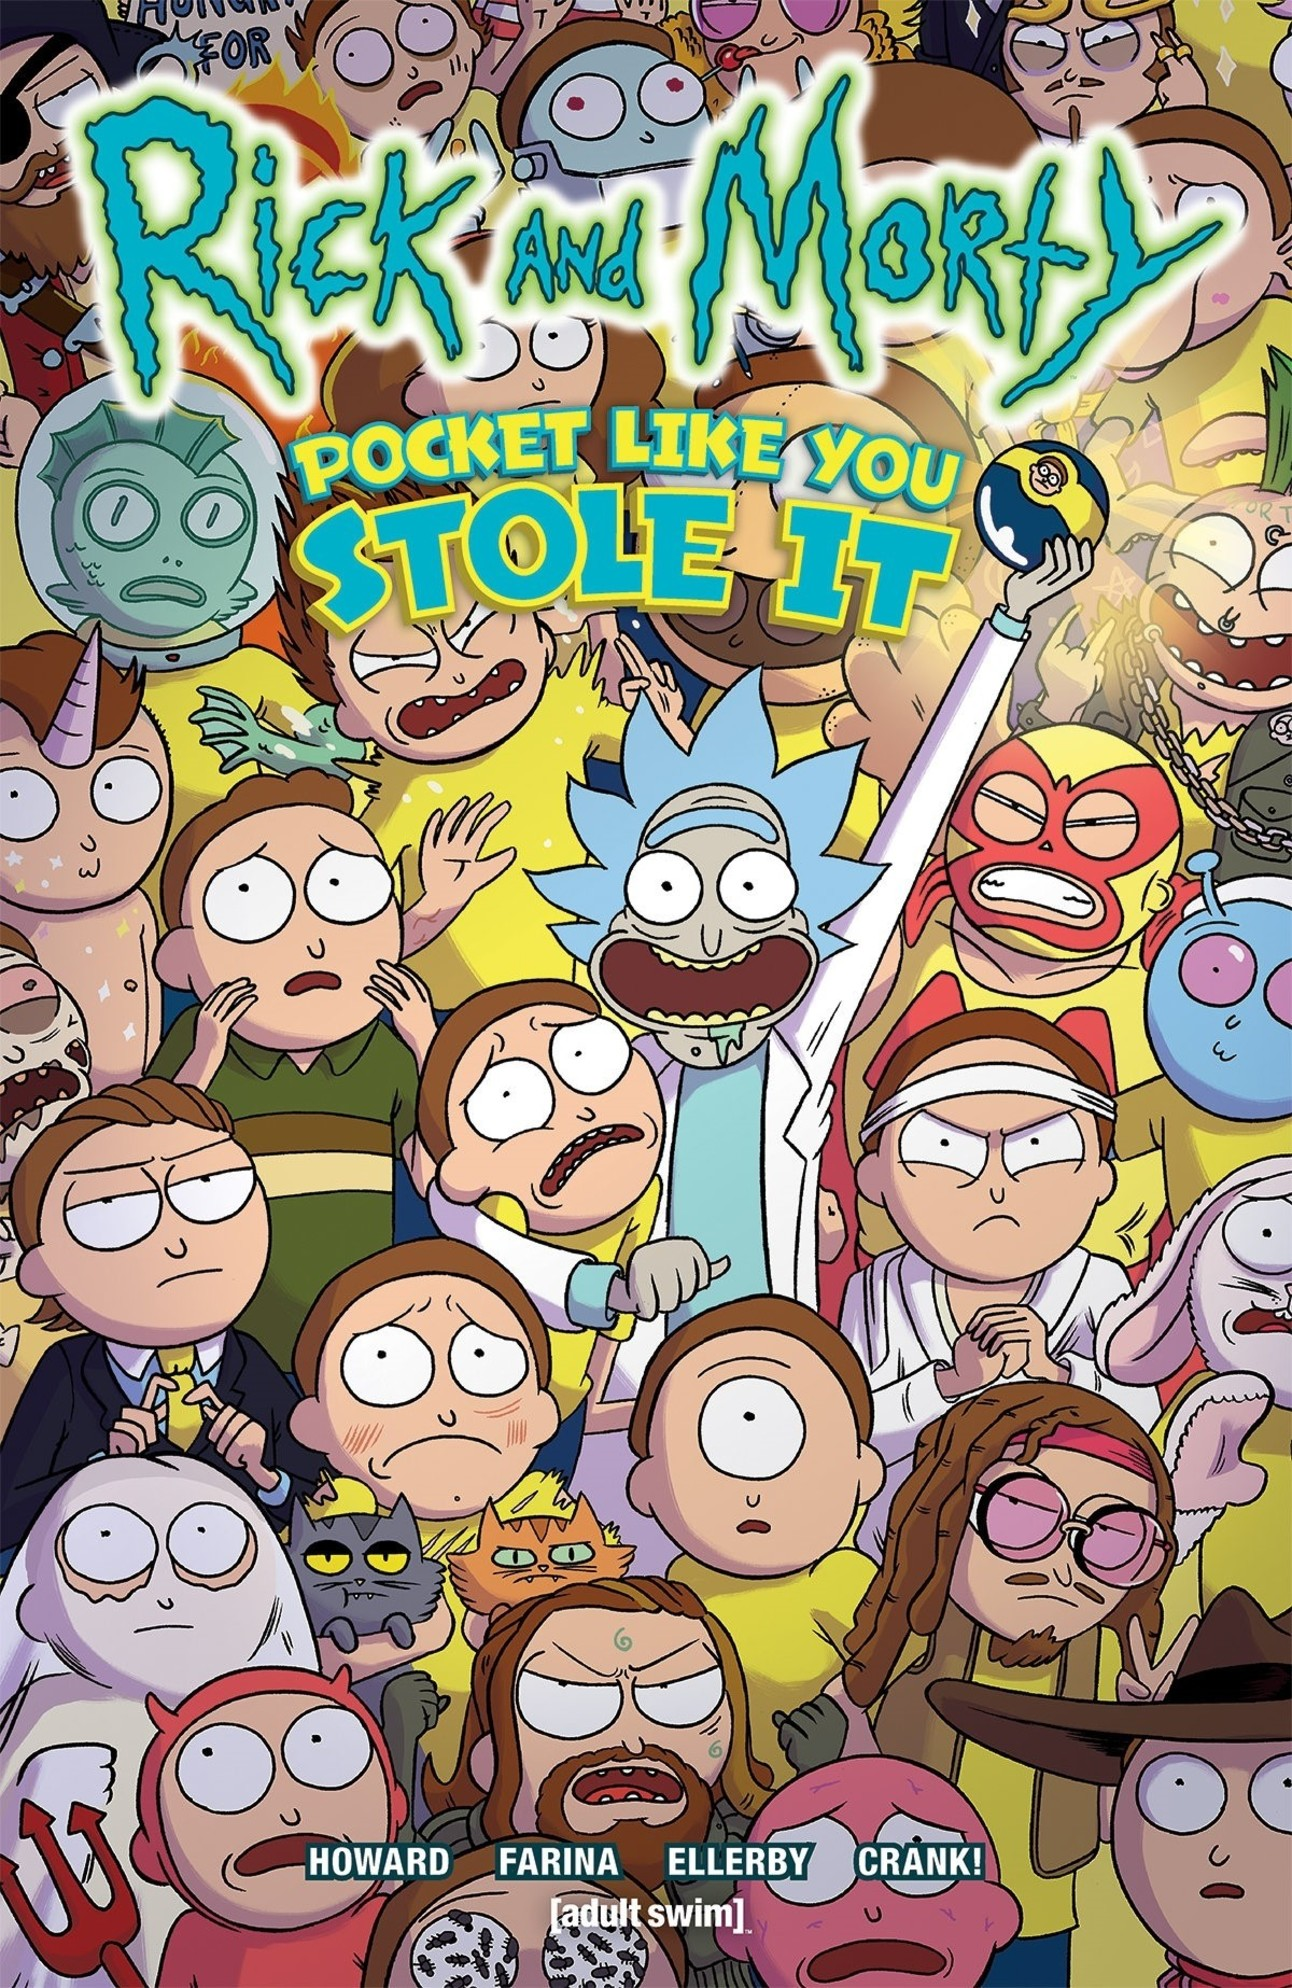 oni_rick_morty_pocket_like_you_stole_it_cover.jpg